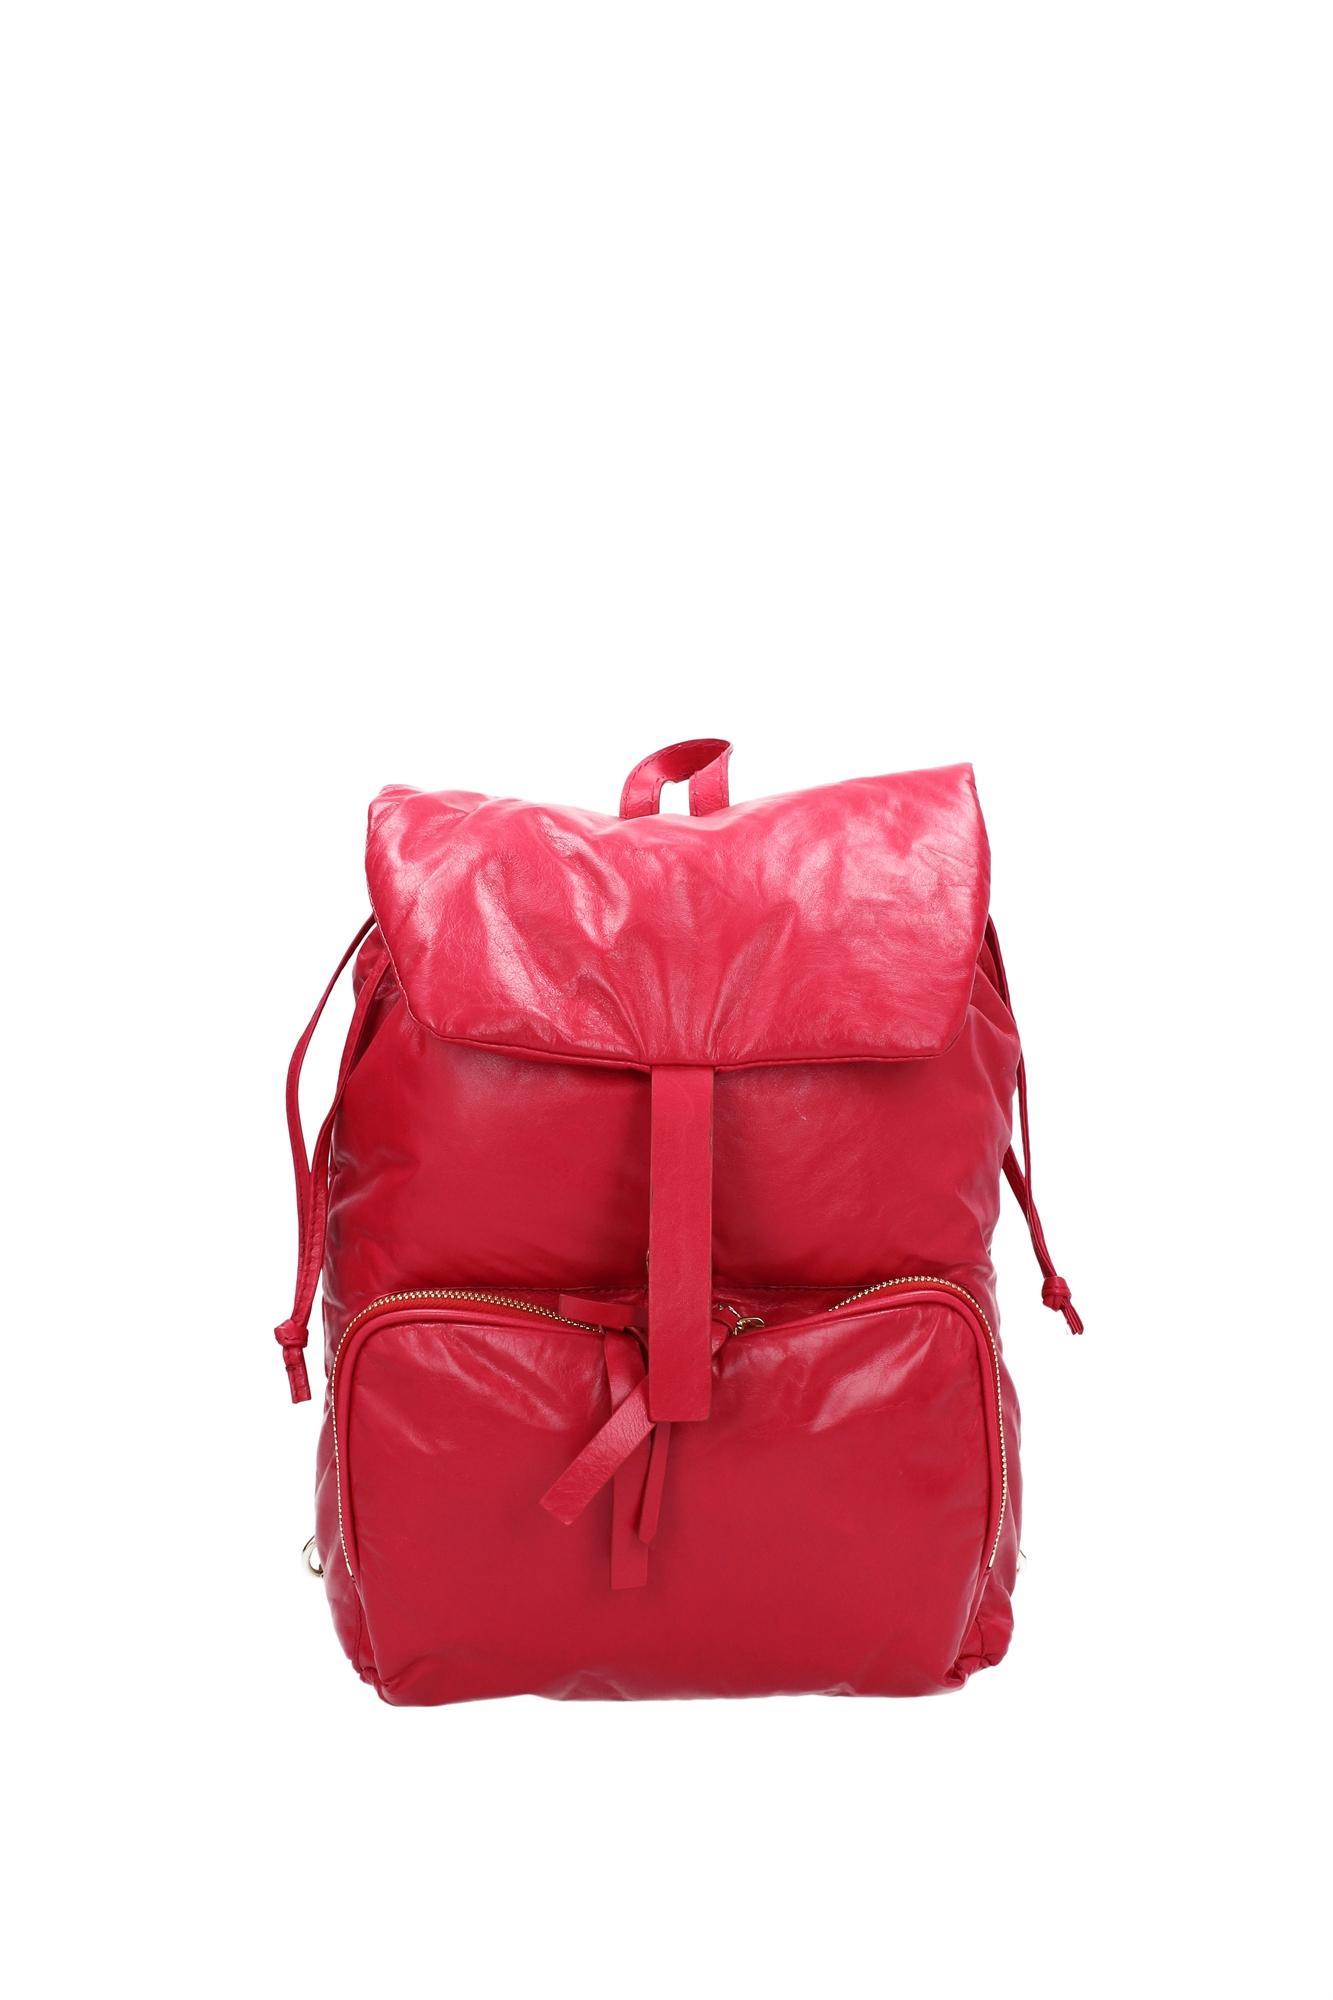 tasche rucksack zanellato damen leder rot 062778471 ebay. Black Bedroom Furniture Sets. Home Design Ideas